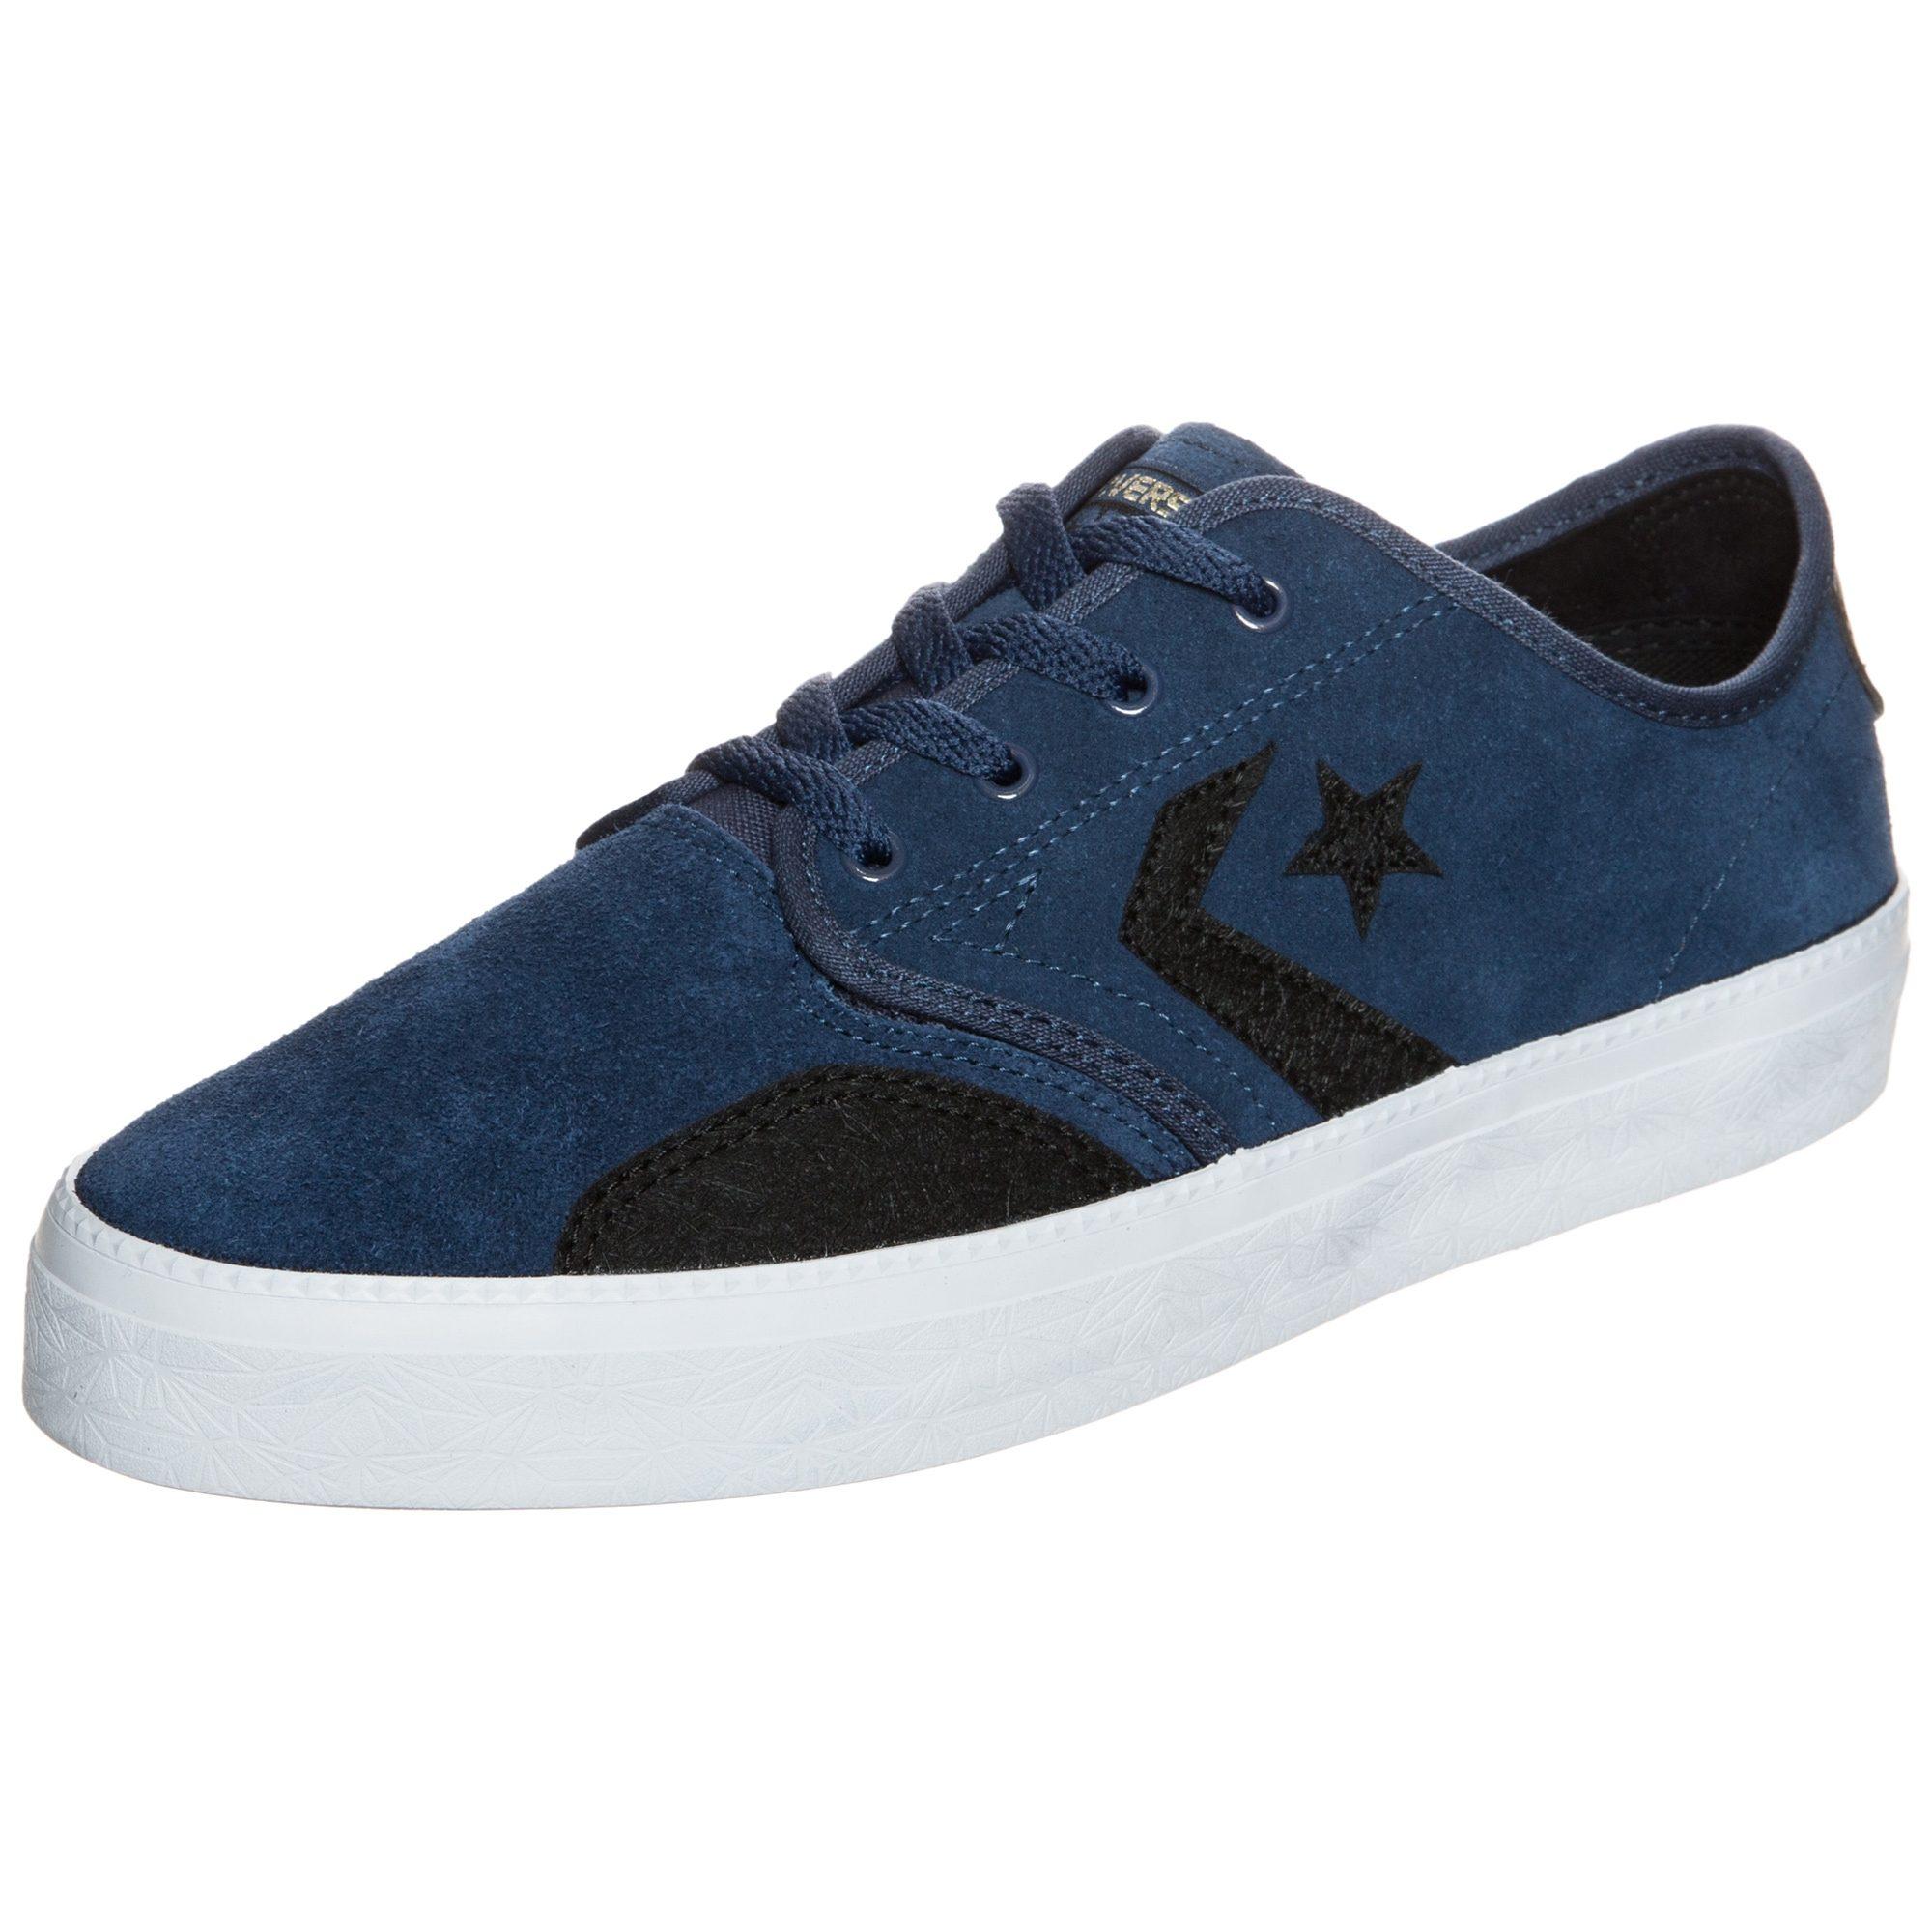 Converse Cons Zakim OX Sneaker online kaufen  dunkelblau #ft5_slash# weiß